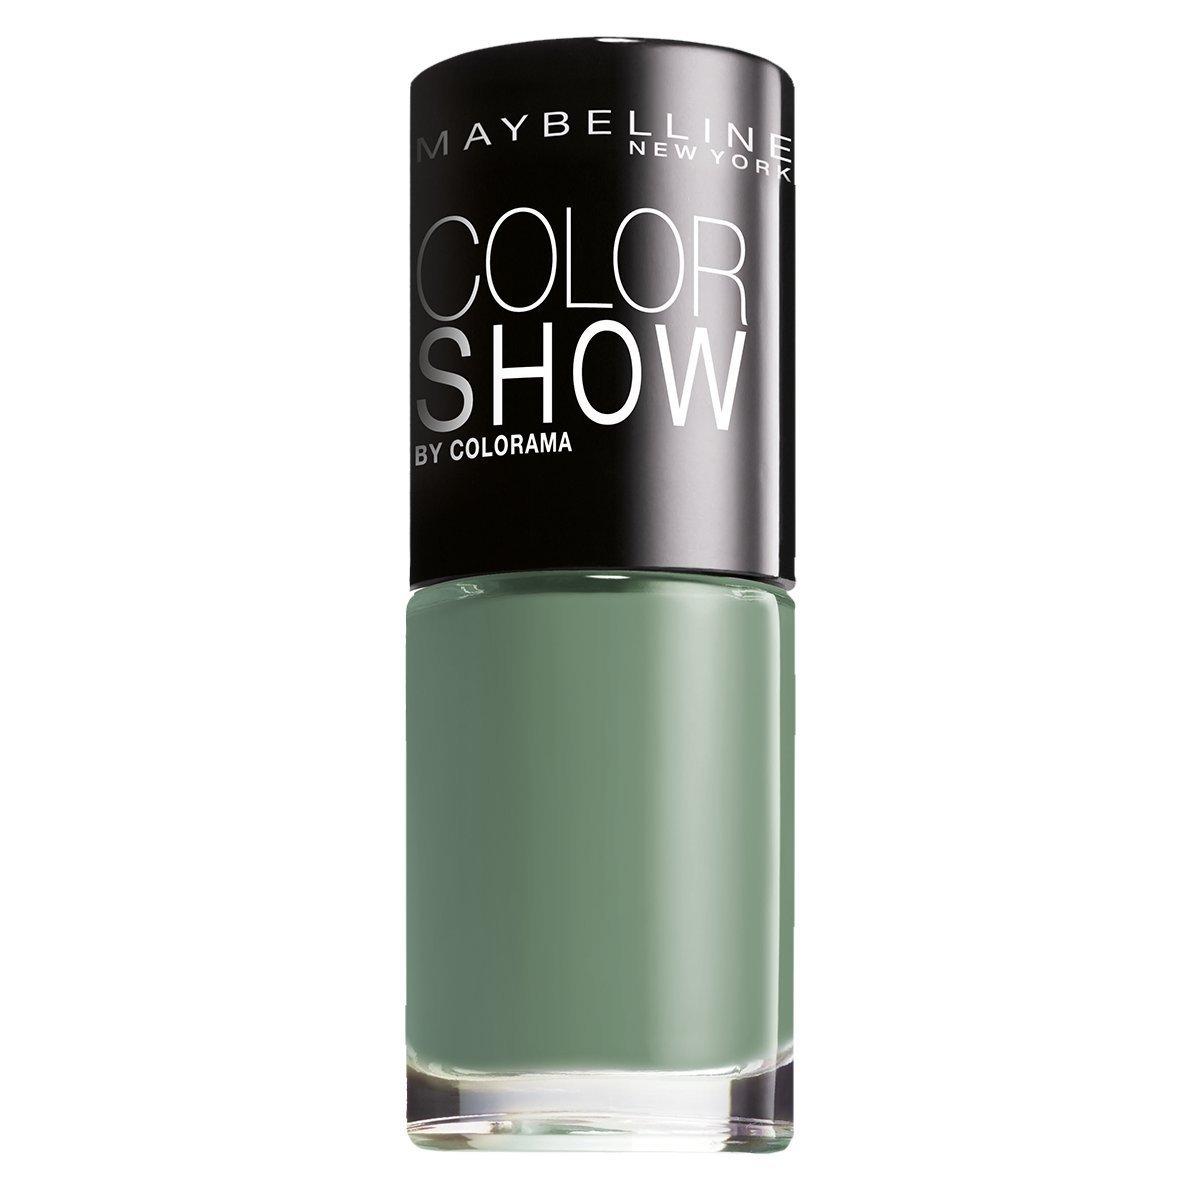 maybelline verde oliva autunno inverno